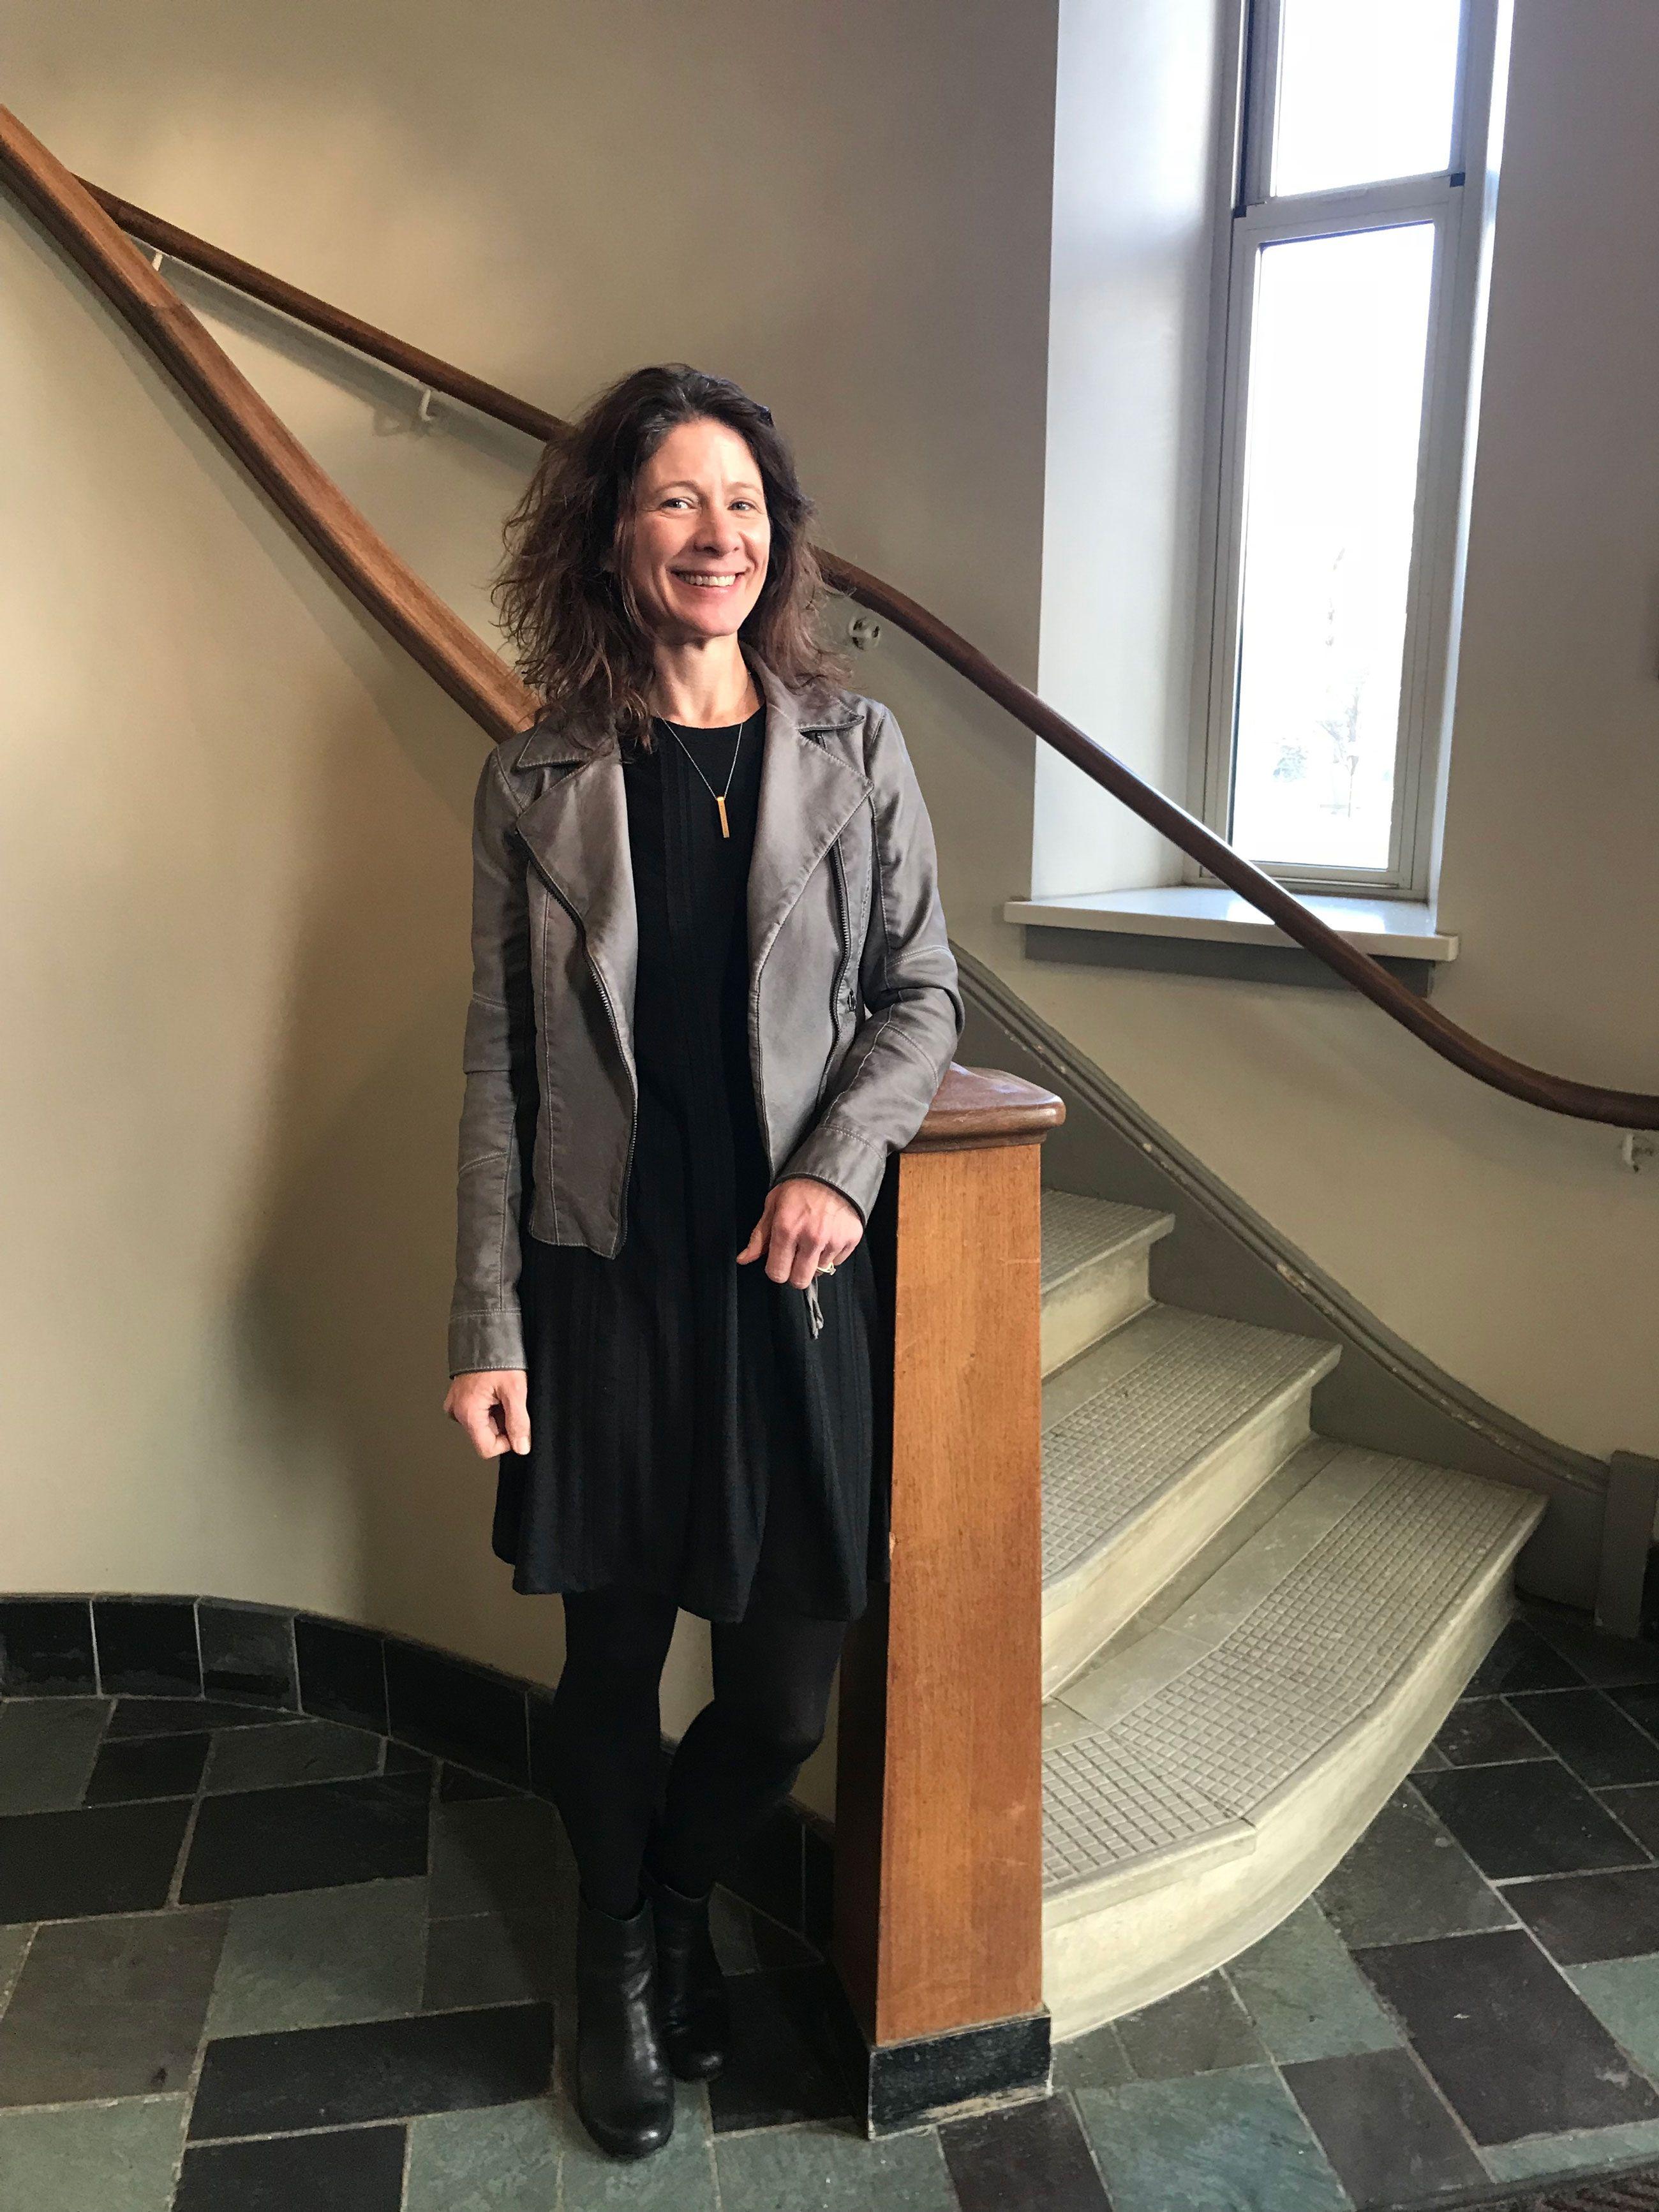 Cheryl Sorenson at Blanchard Hall